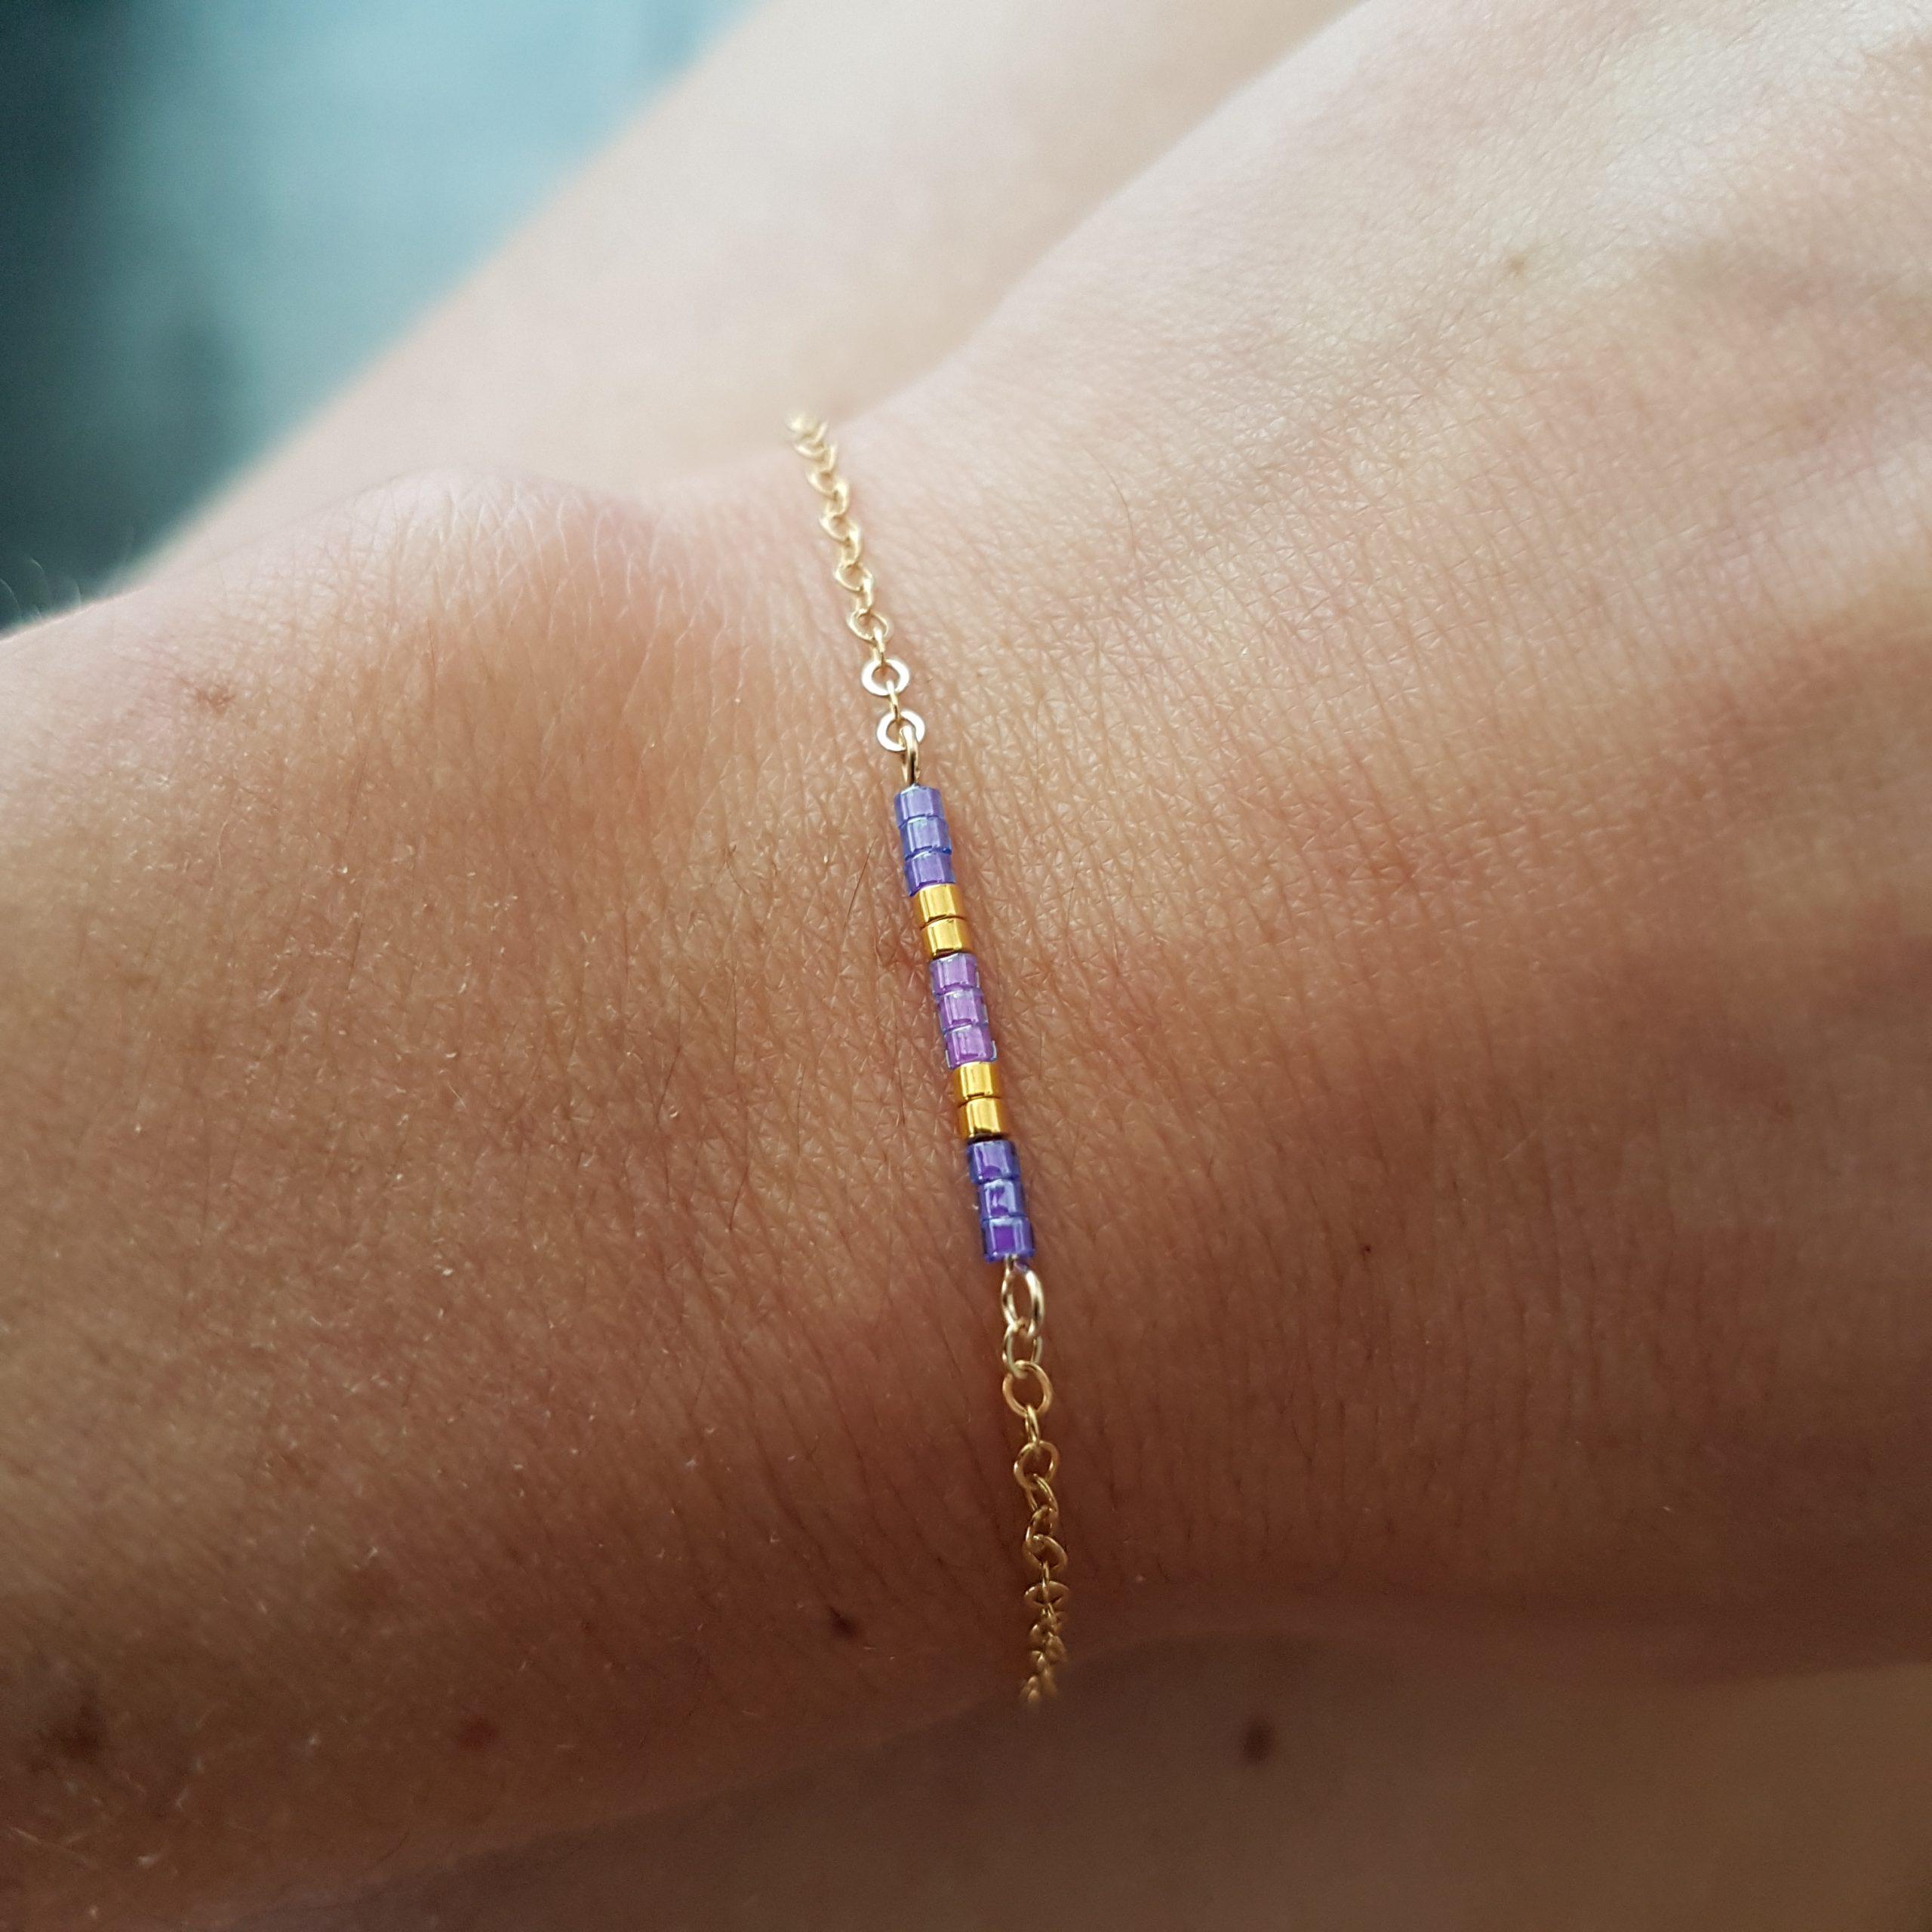 Cadeau Bijou artisanal lyon Bracelet Agathe violet plaqué or miyuki